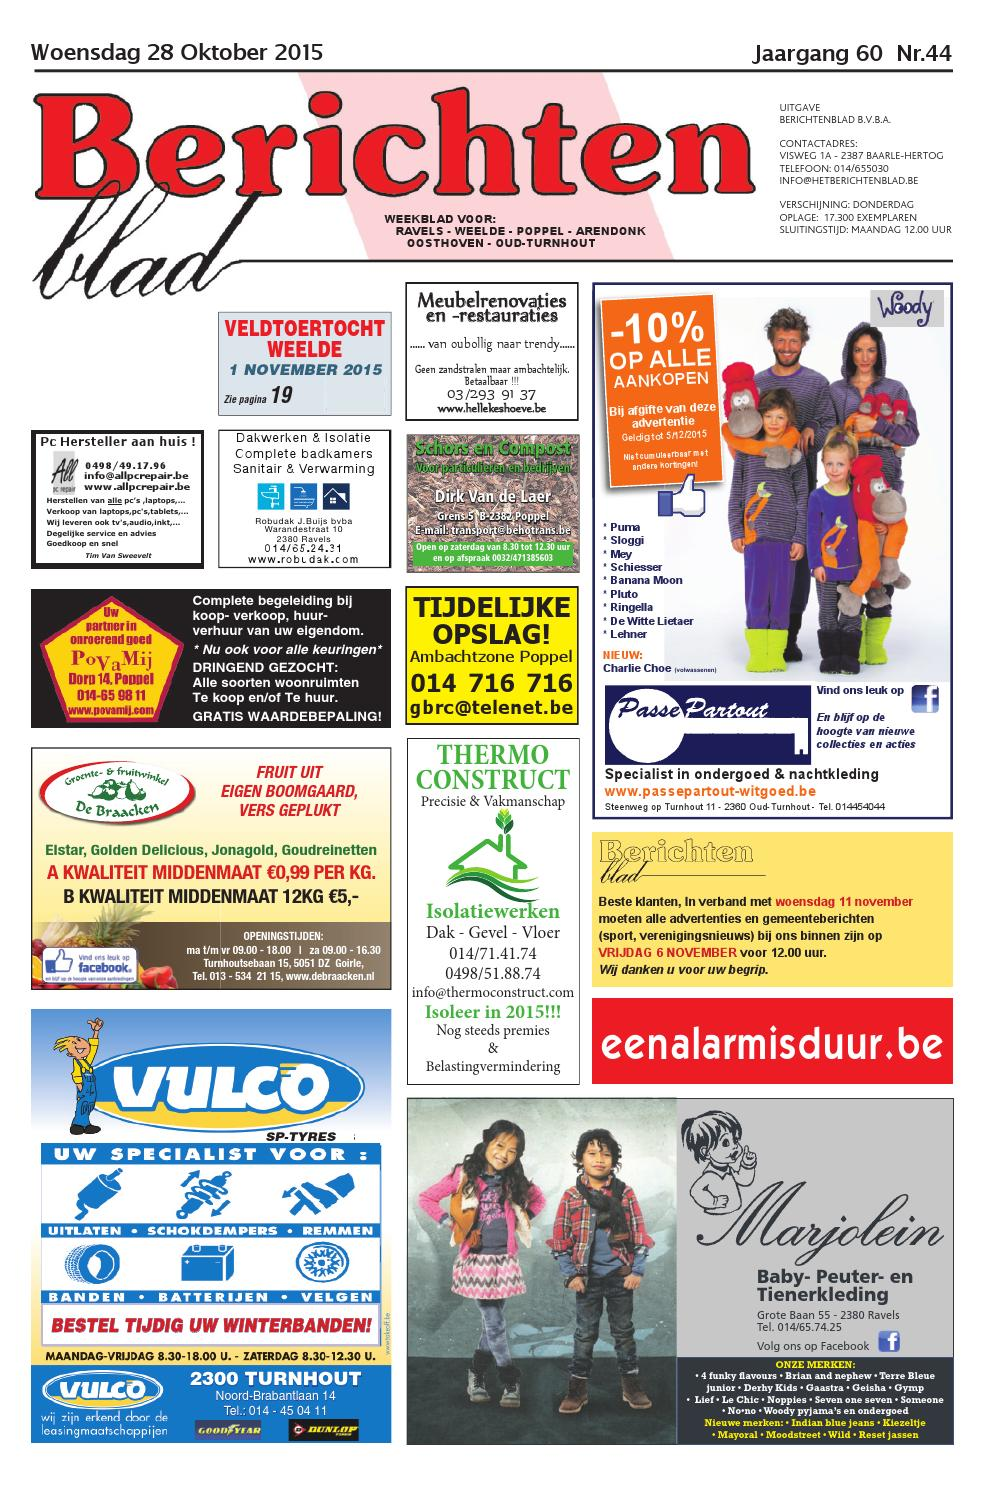 bc7e5580cea Berichtenblad 28-10-2015 by Uitgeverij Em de Jong - issuu